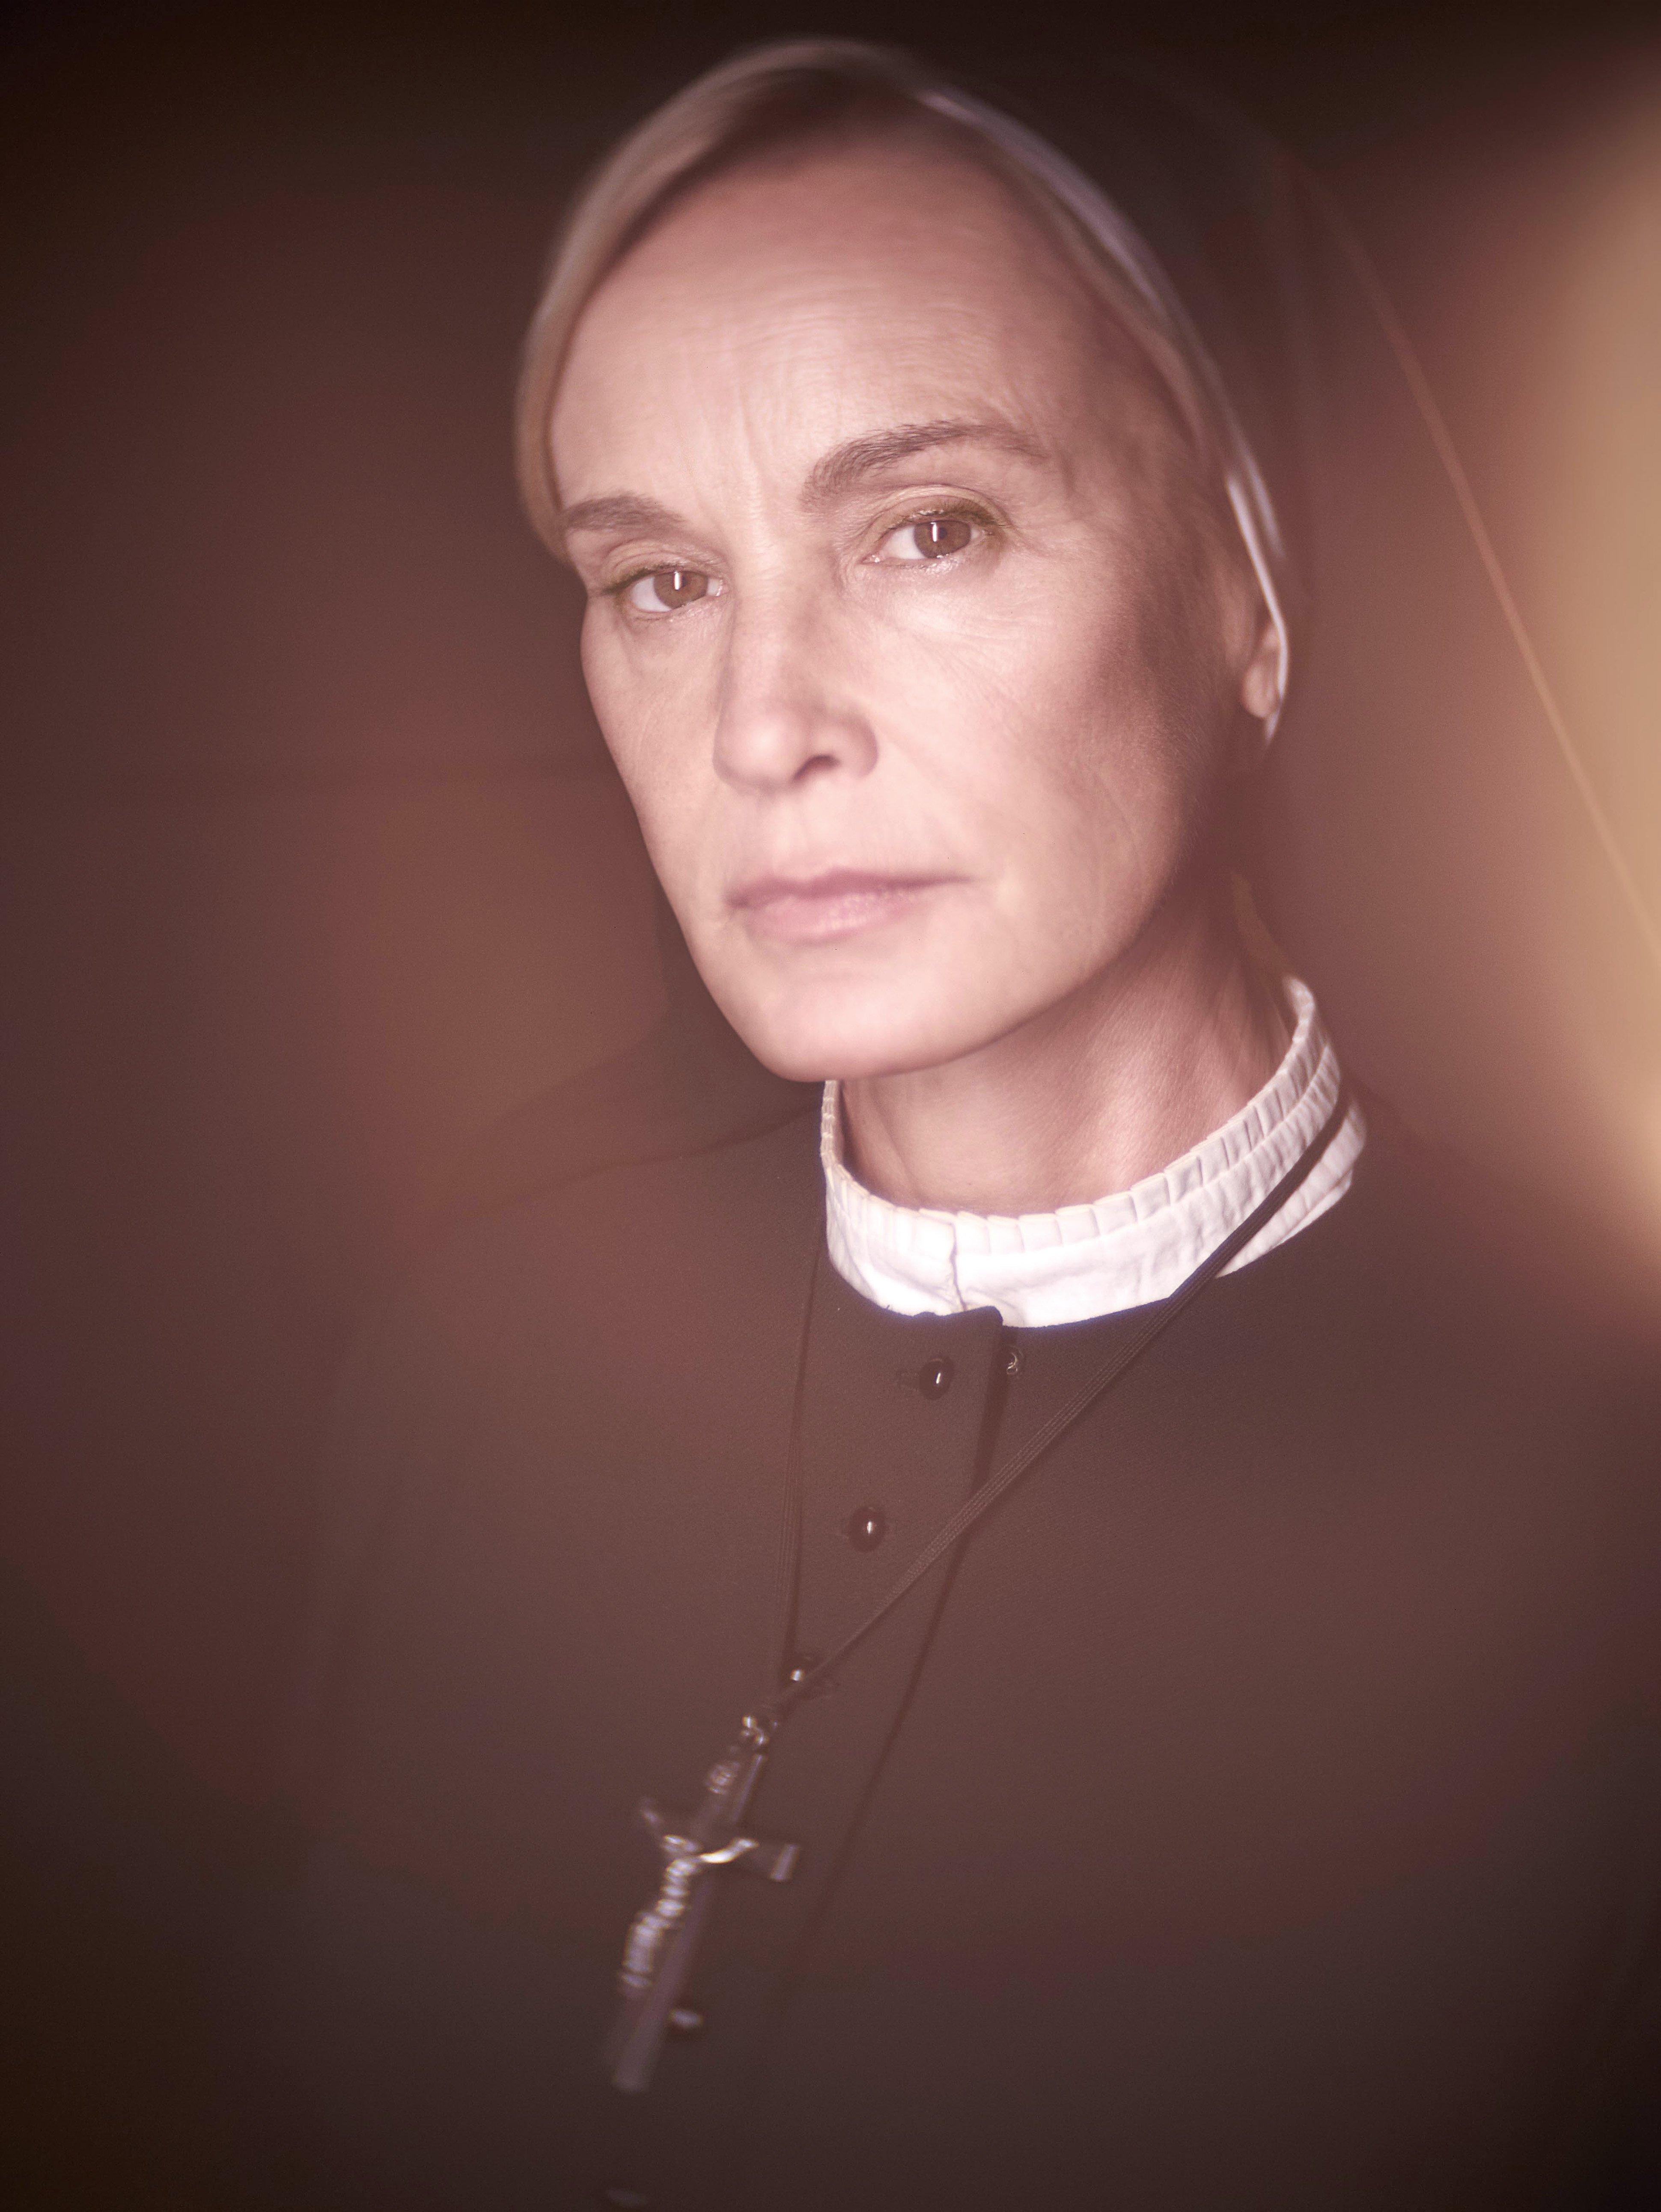 Sister Jude | American Horror Story Wiki | FANDOM powered by Wikia